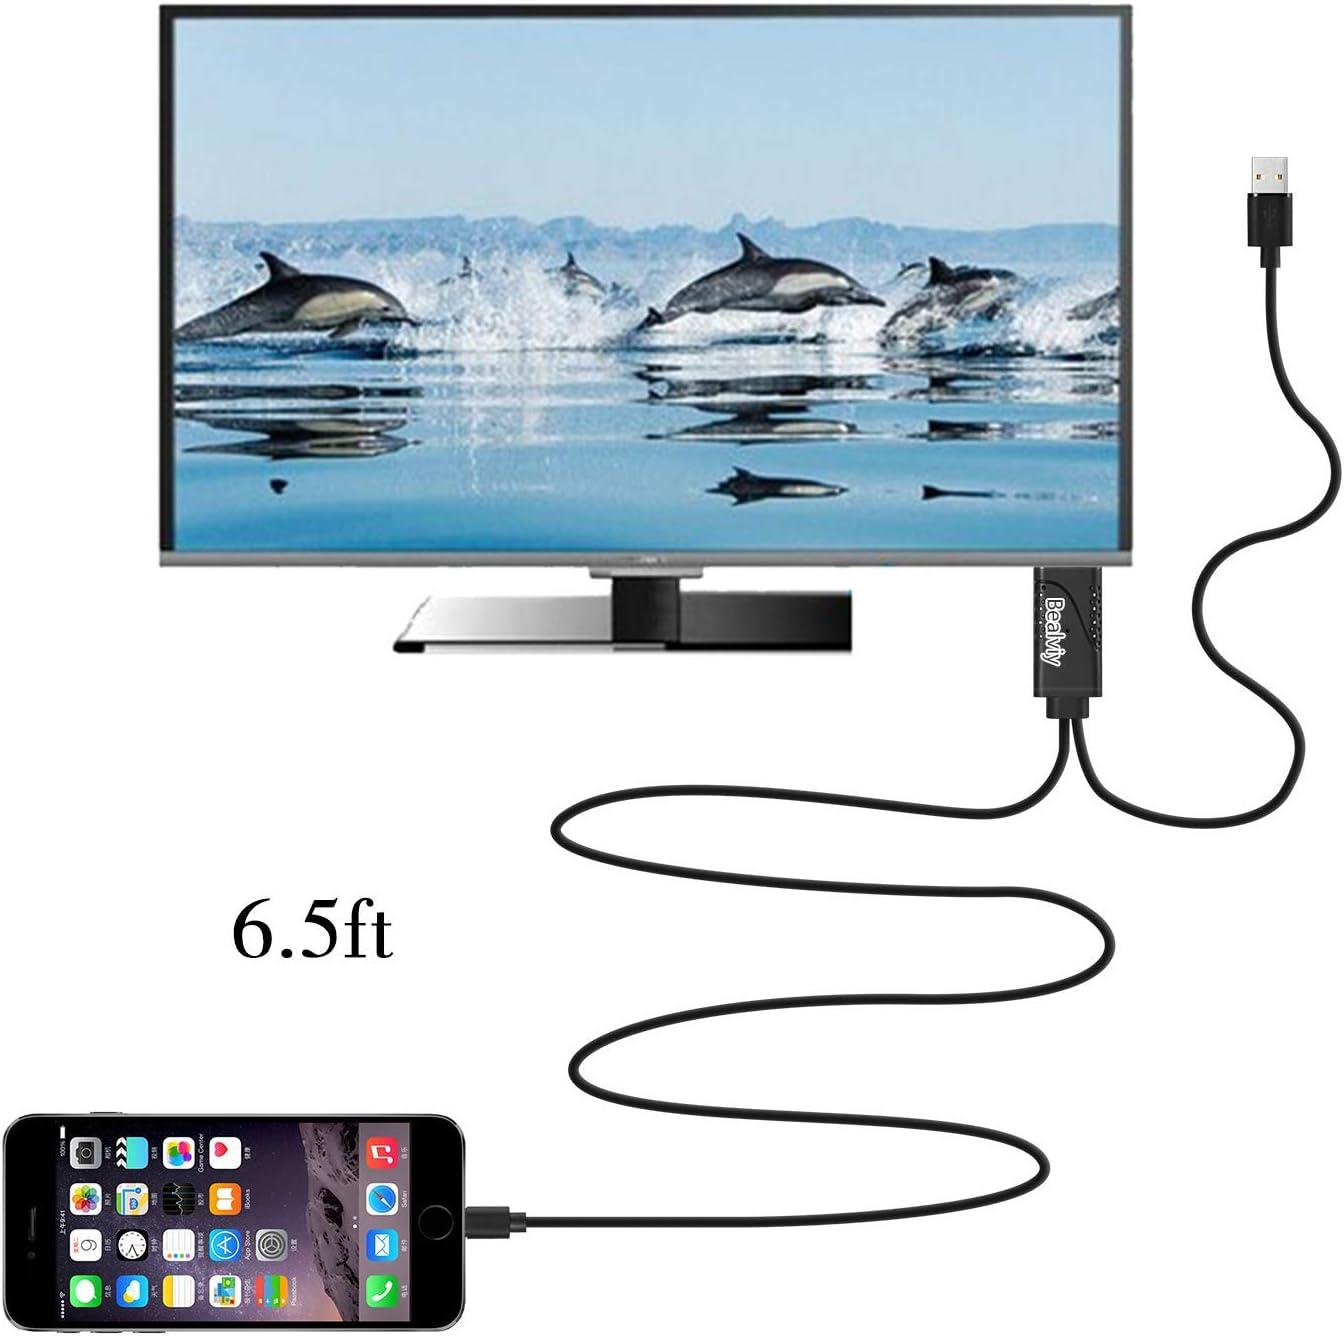 Pad Bealviy Cavo Adattatore Phone HDMI Pod a TV Proiettore Monitor Adattatore Phone a TV HDMI,1080P HDMI Adattatore AV Digitale HDTV SYNC Schermo per Phone XS Max XR 8 7 6 5